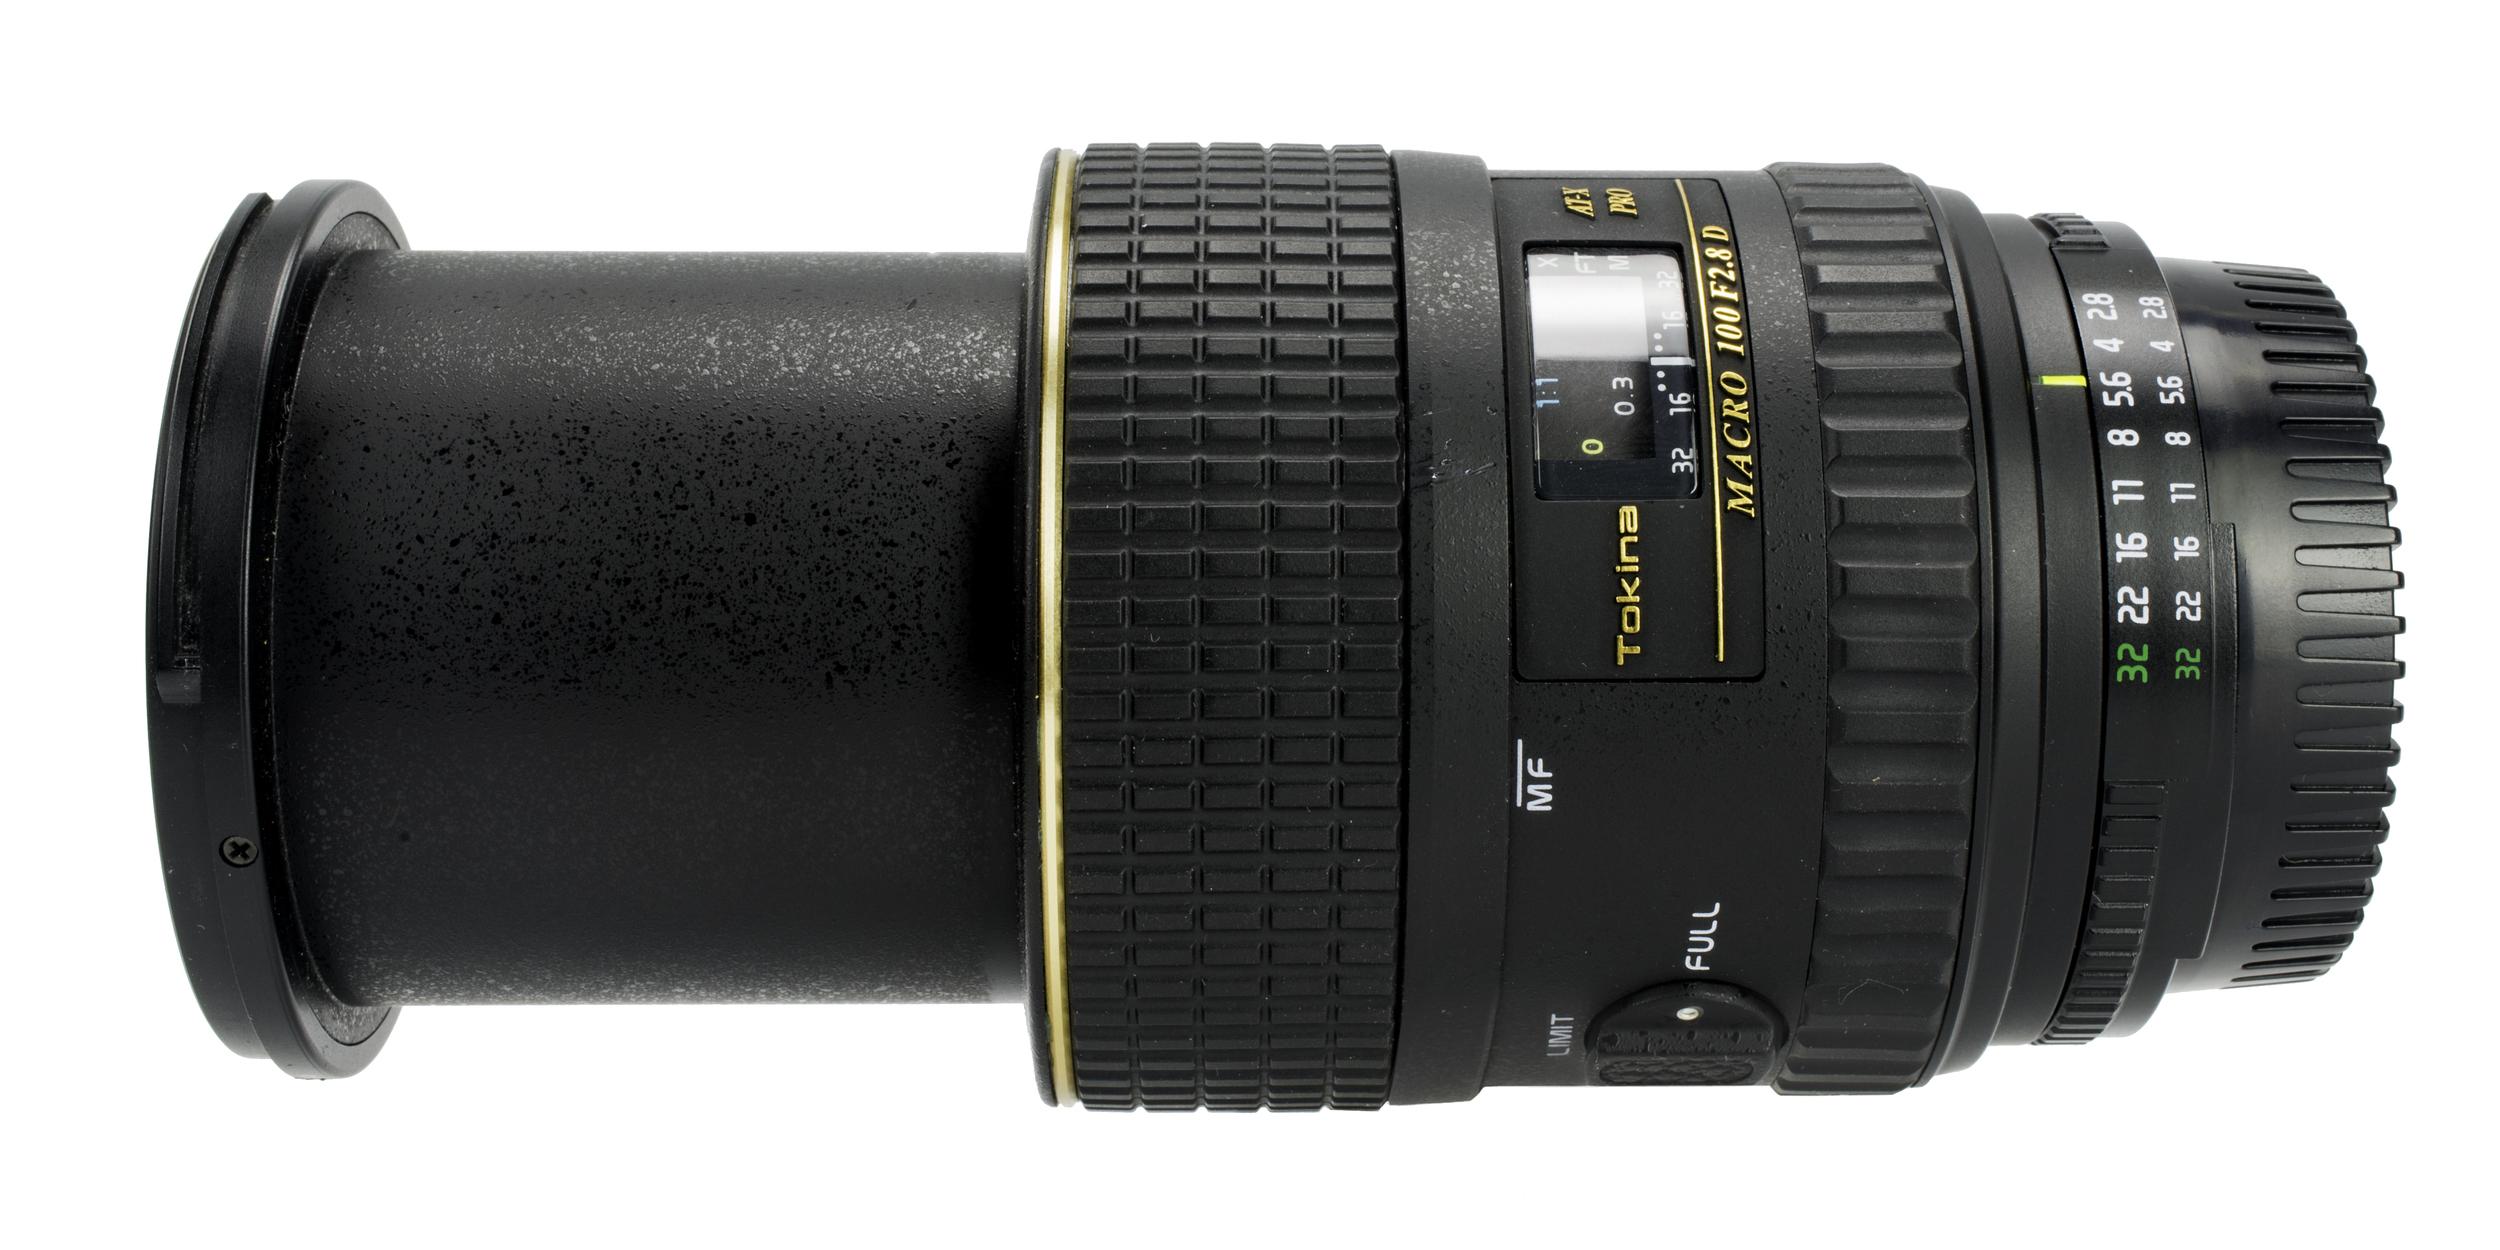 Focused at 0.3 meter/12-inches -Tokina 100mm f/2.8 Macro AT-X PRO D